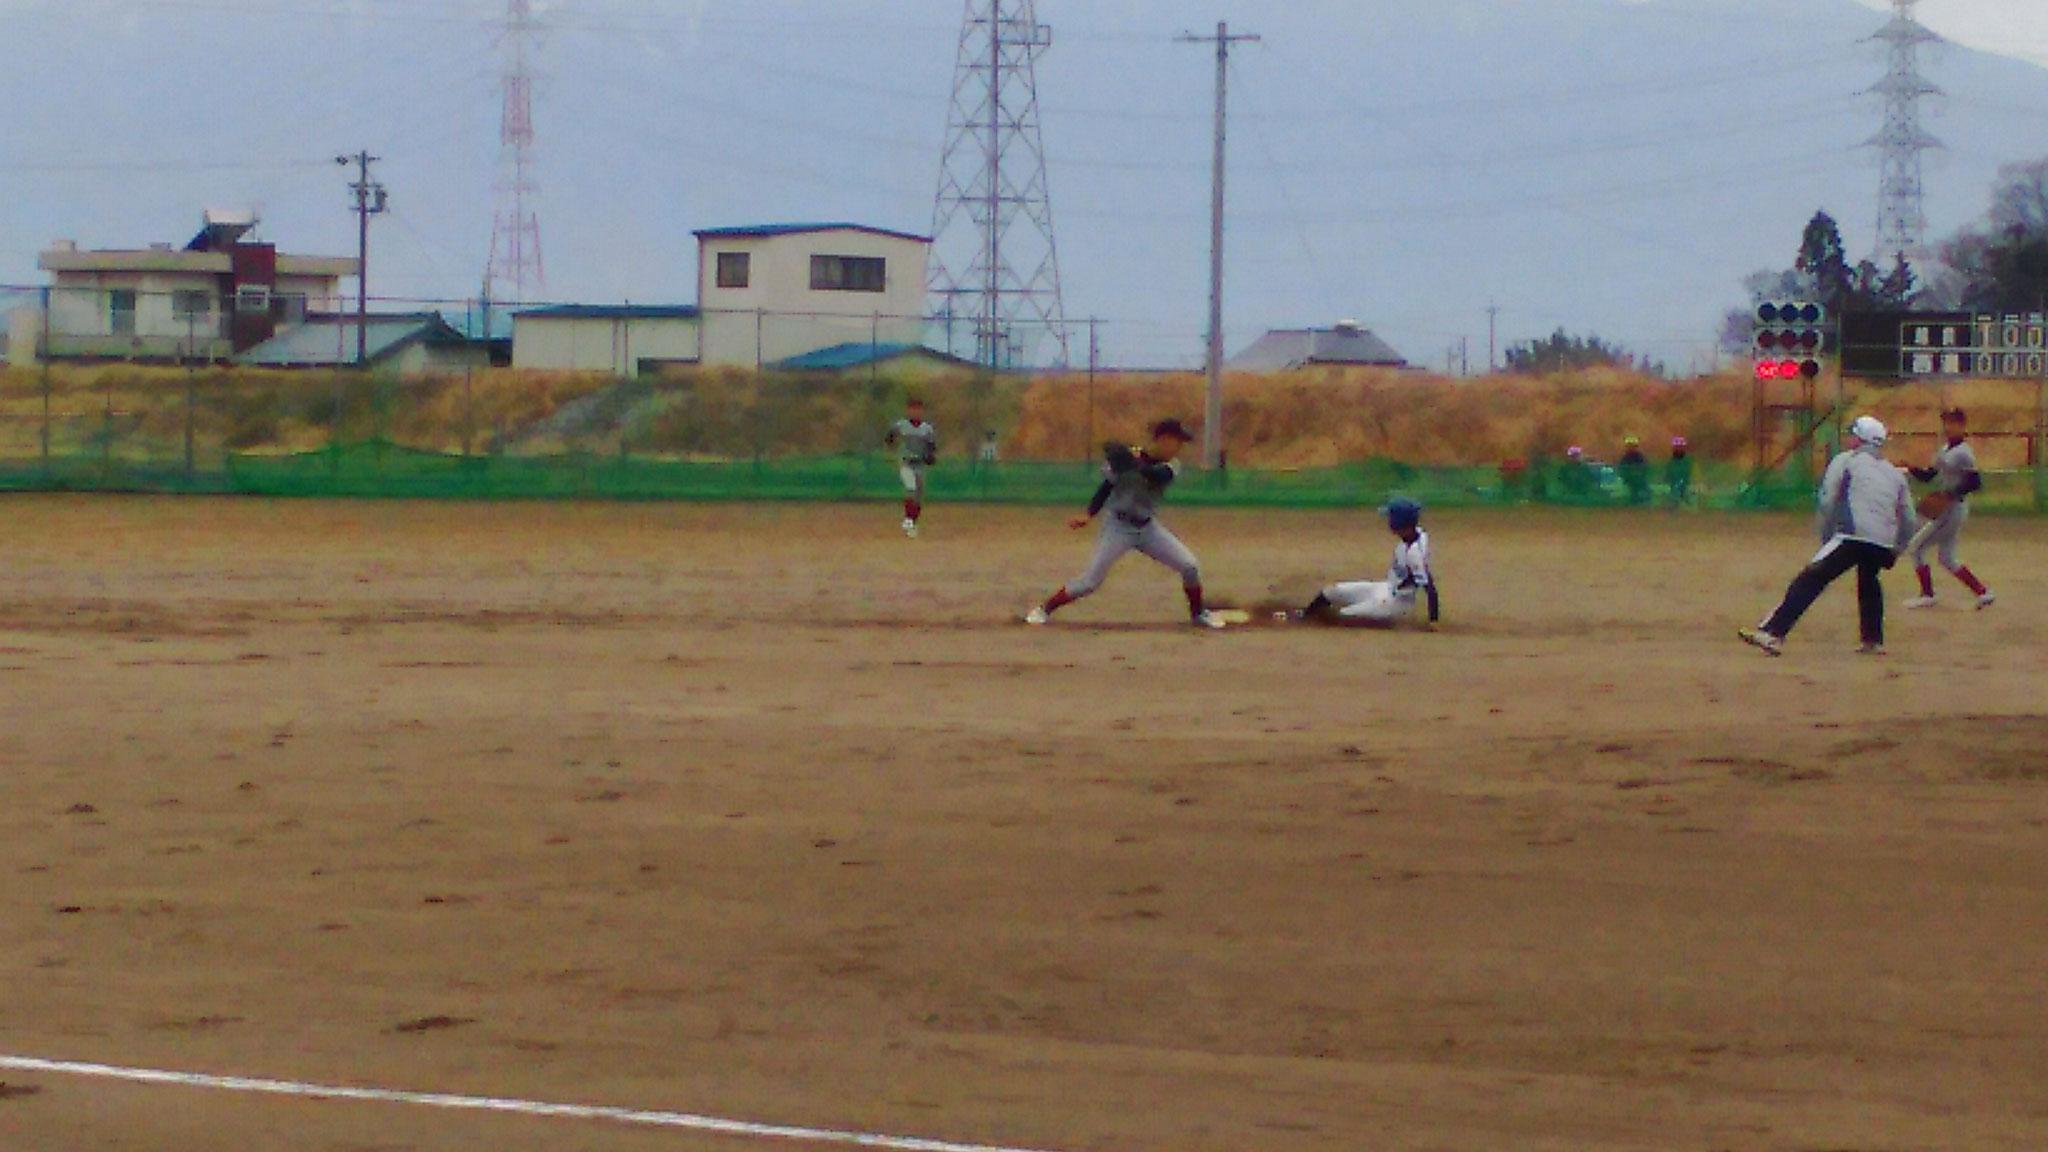 88 Takemura Daiki